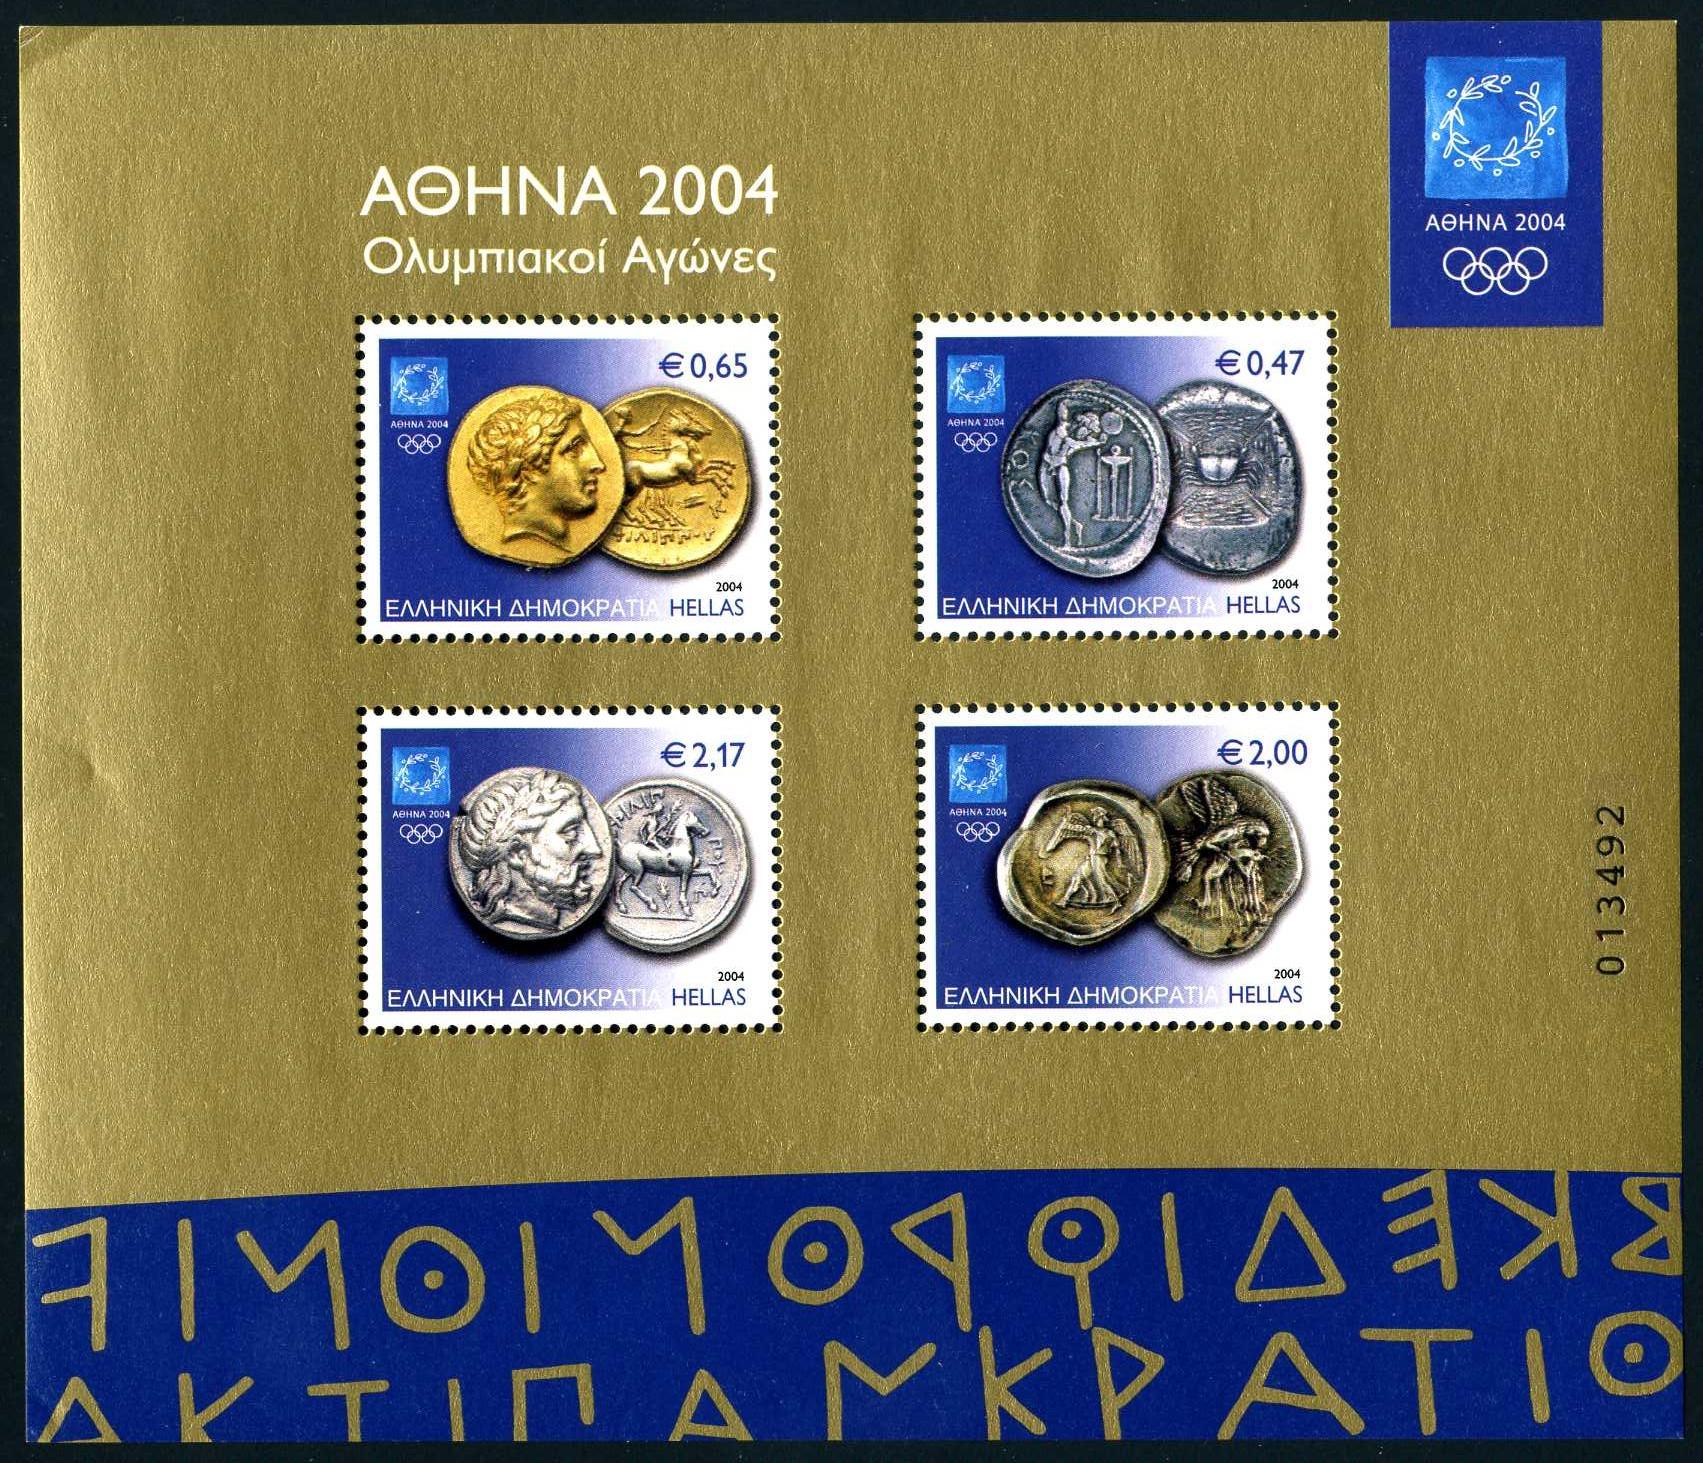 GR 001 2004 Olympia Athen.jpg